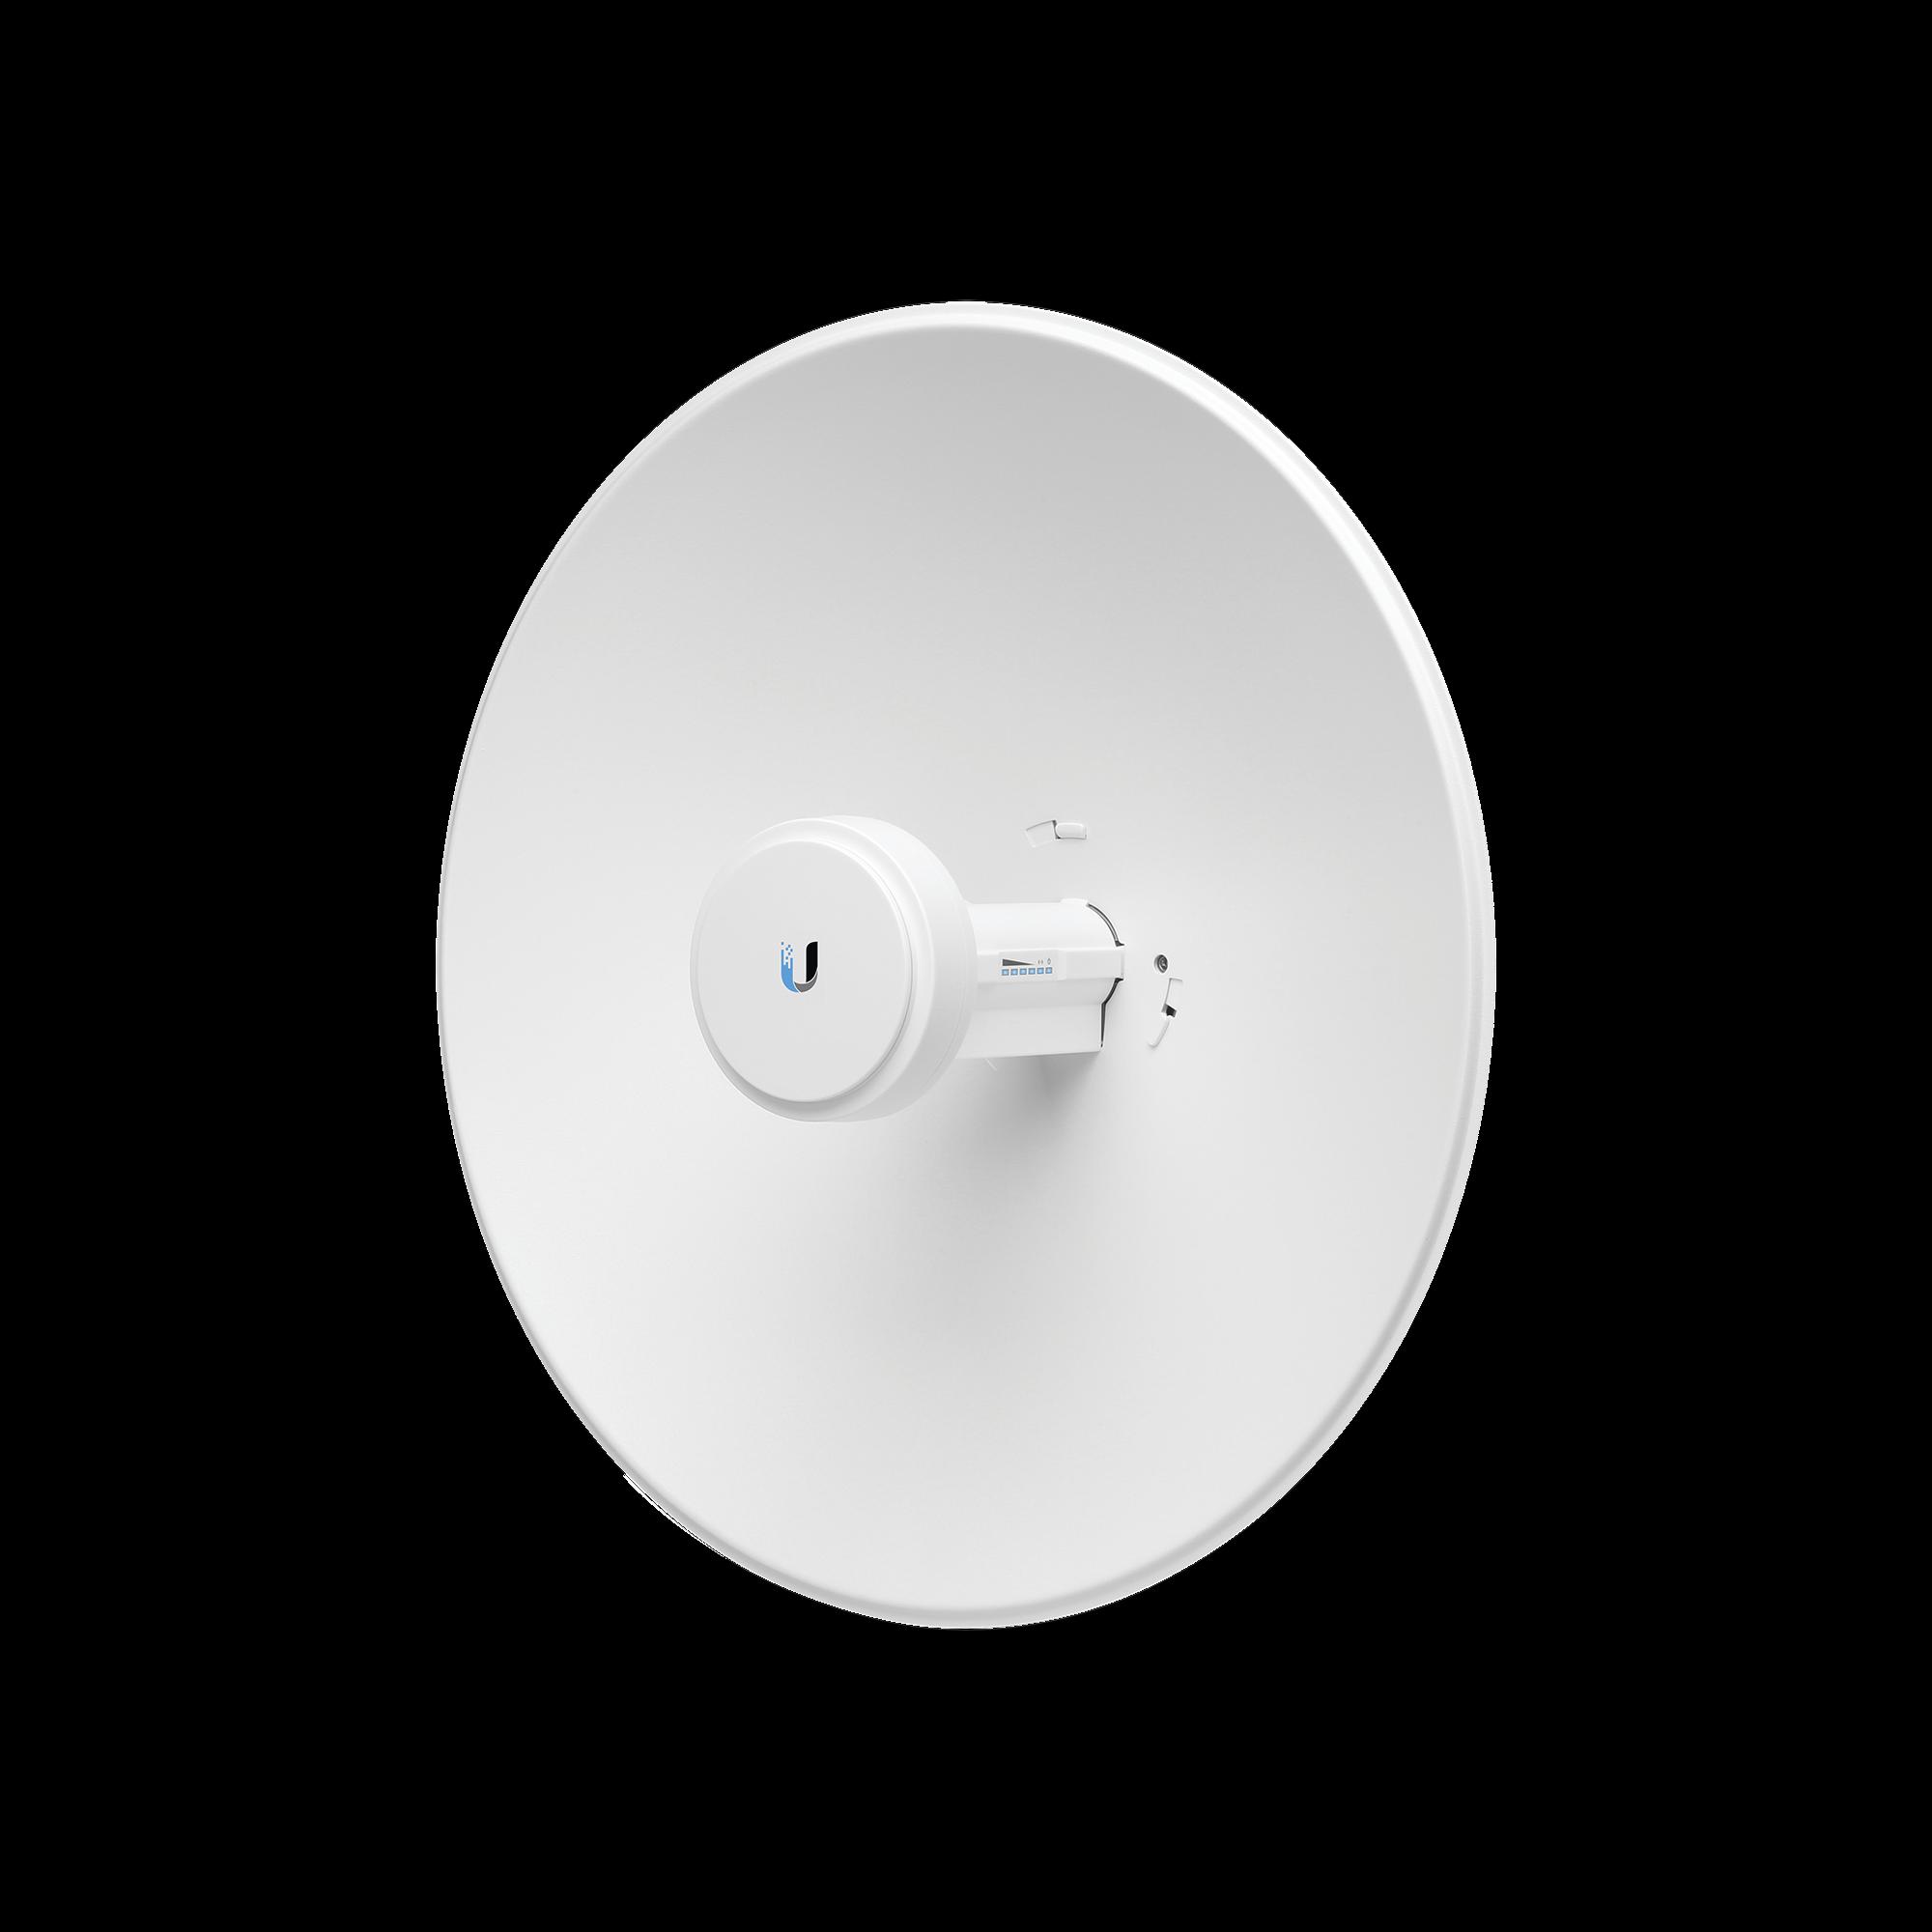 PowerBeam airMAX AC hasta 330 Mbps, frecuencia 2 GHz (2412-2472 MHz), antena tipo plato altamente eficiente de 18 dBi